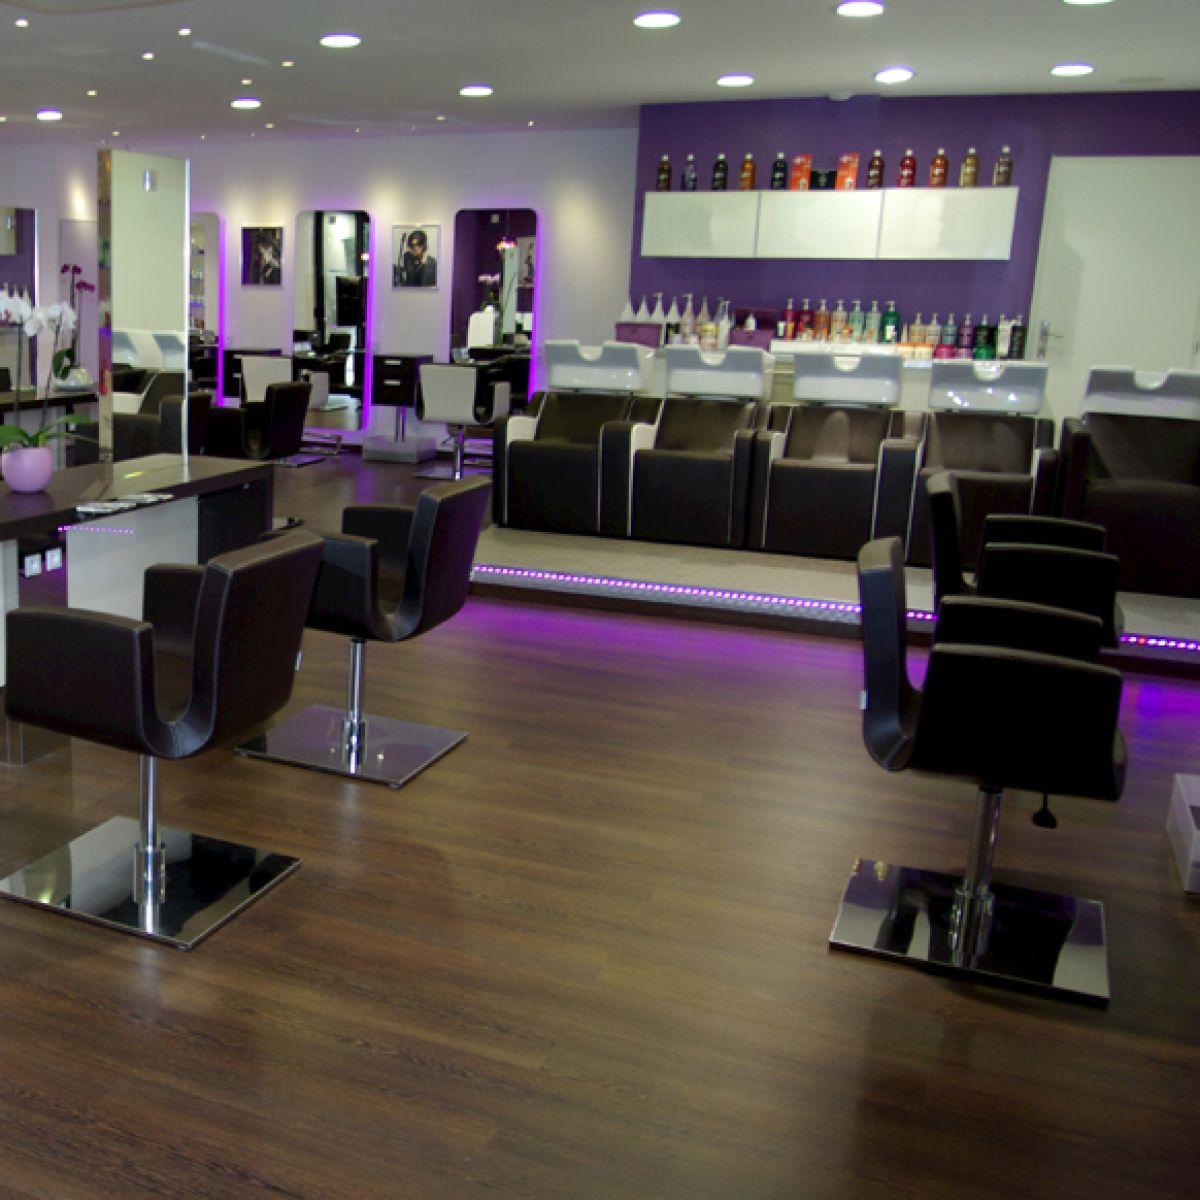 Nelson Mobilier  Fabricant  Mobilier de coiffure Made in France  Agencement de salons de